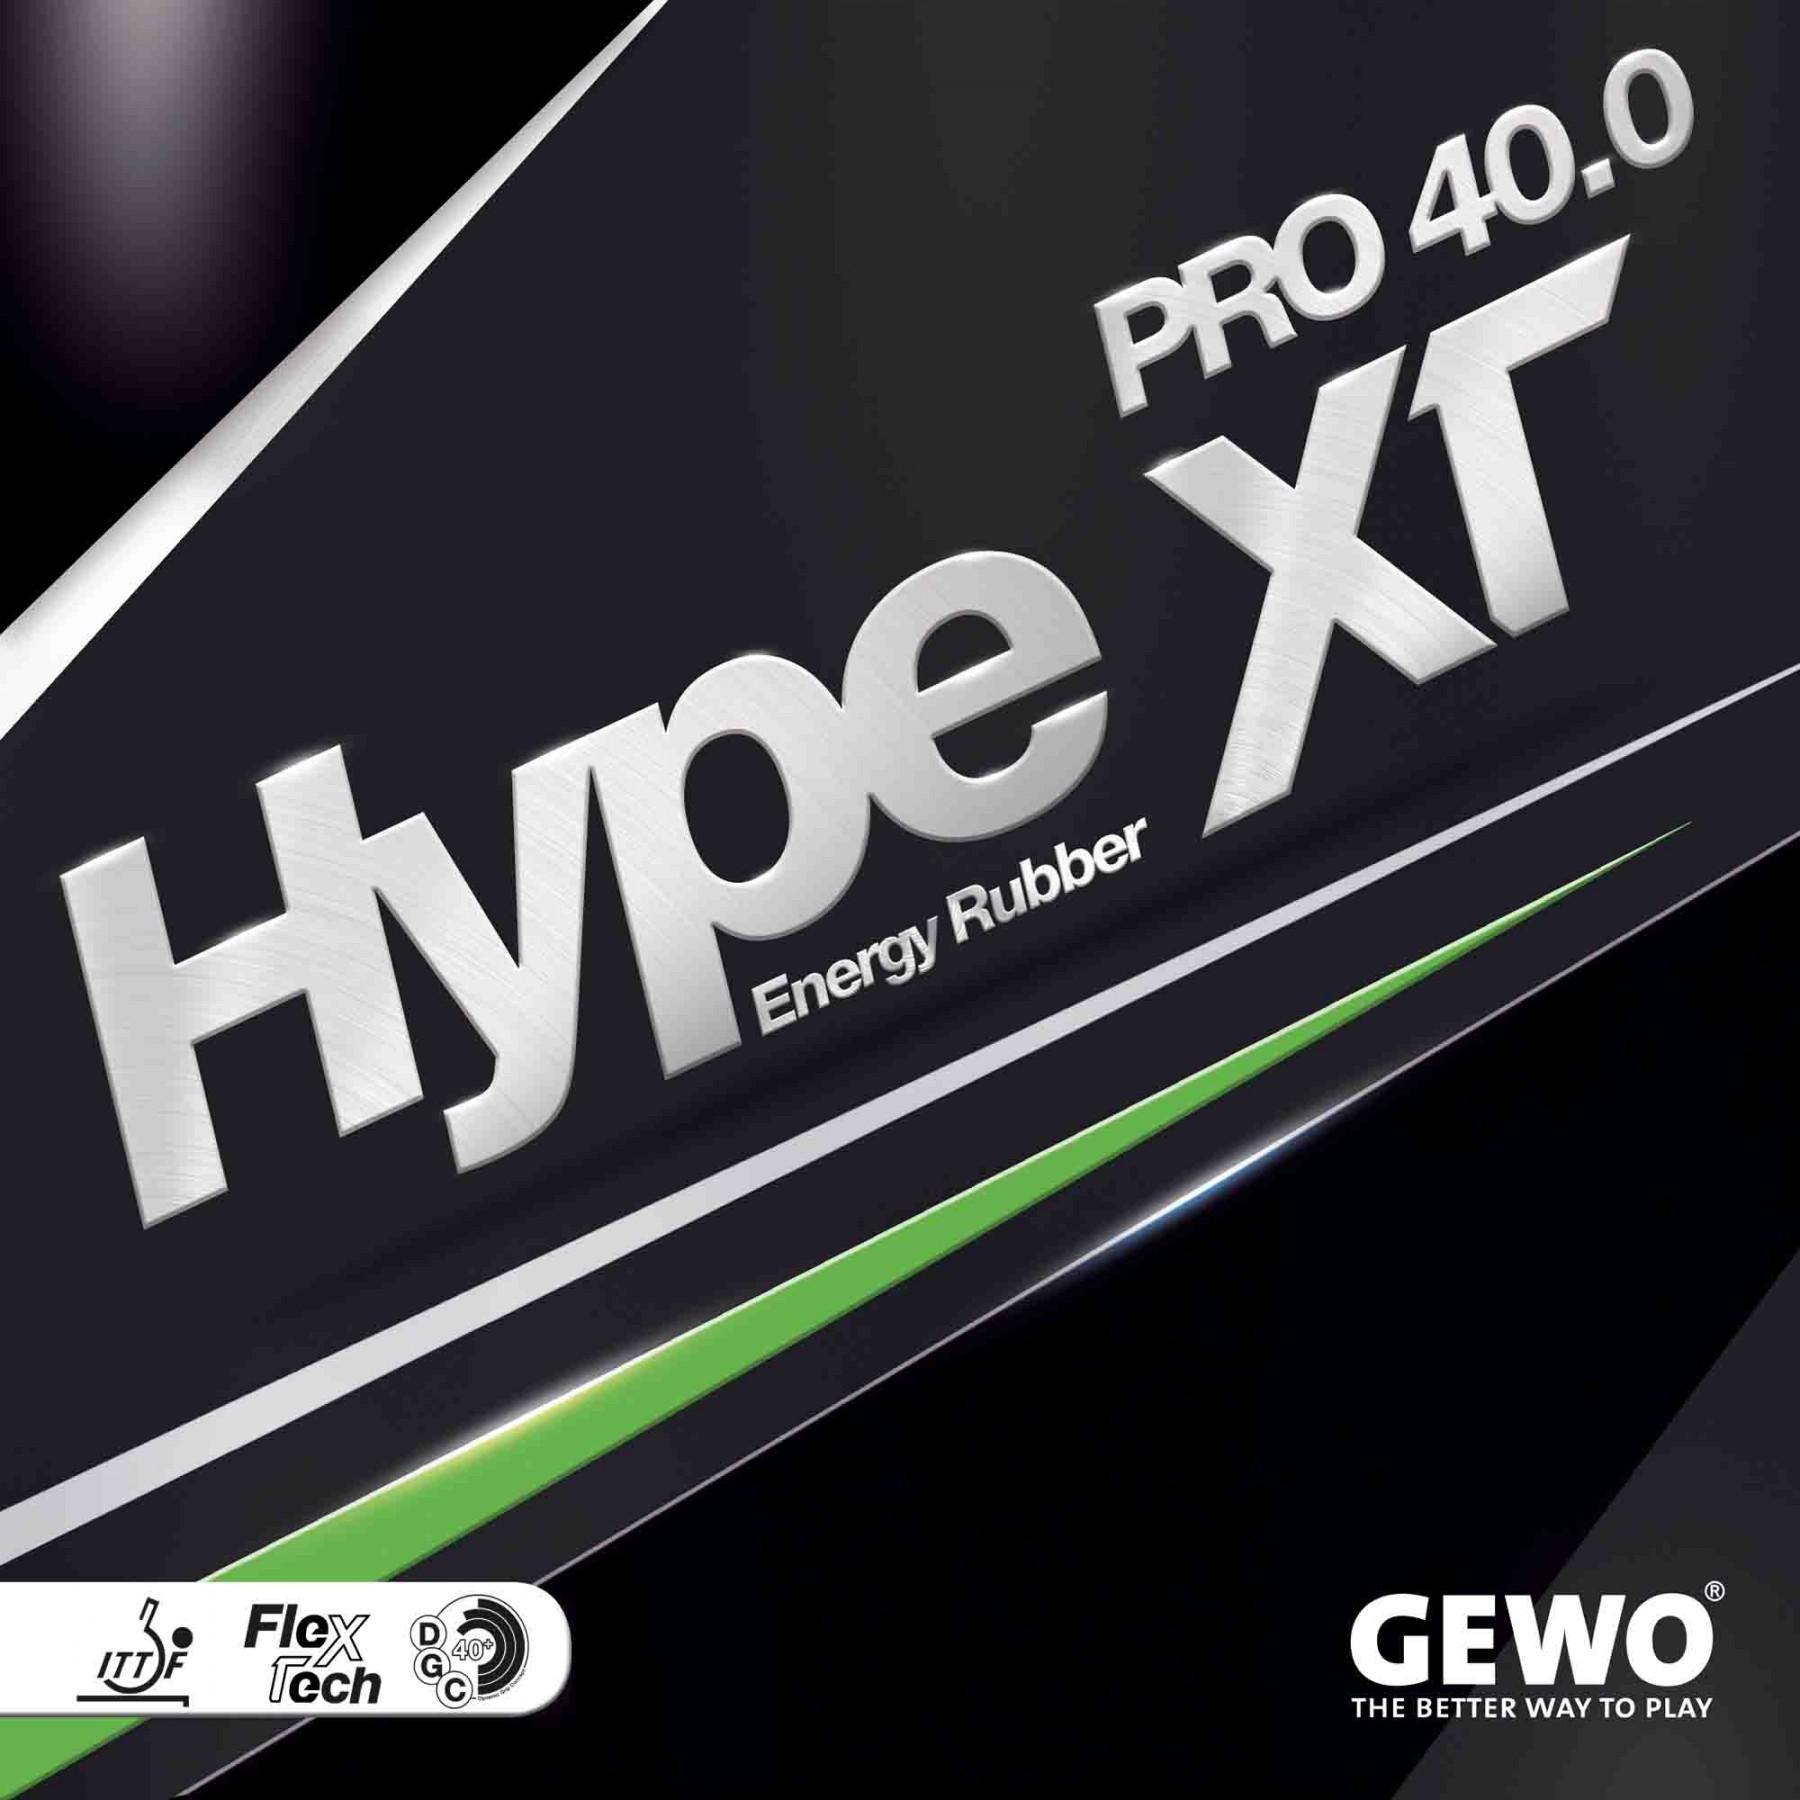 Gewo Hype XT Pro 40.0